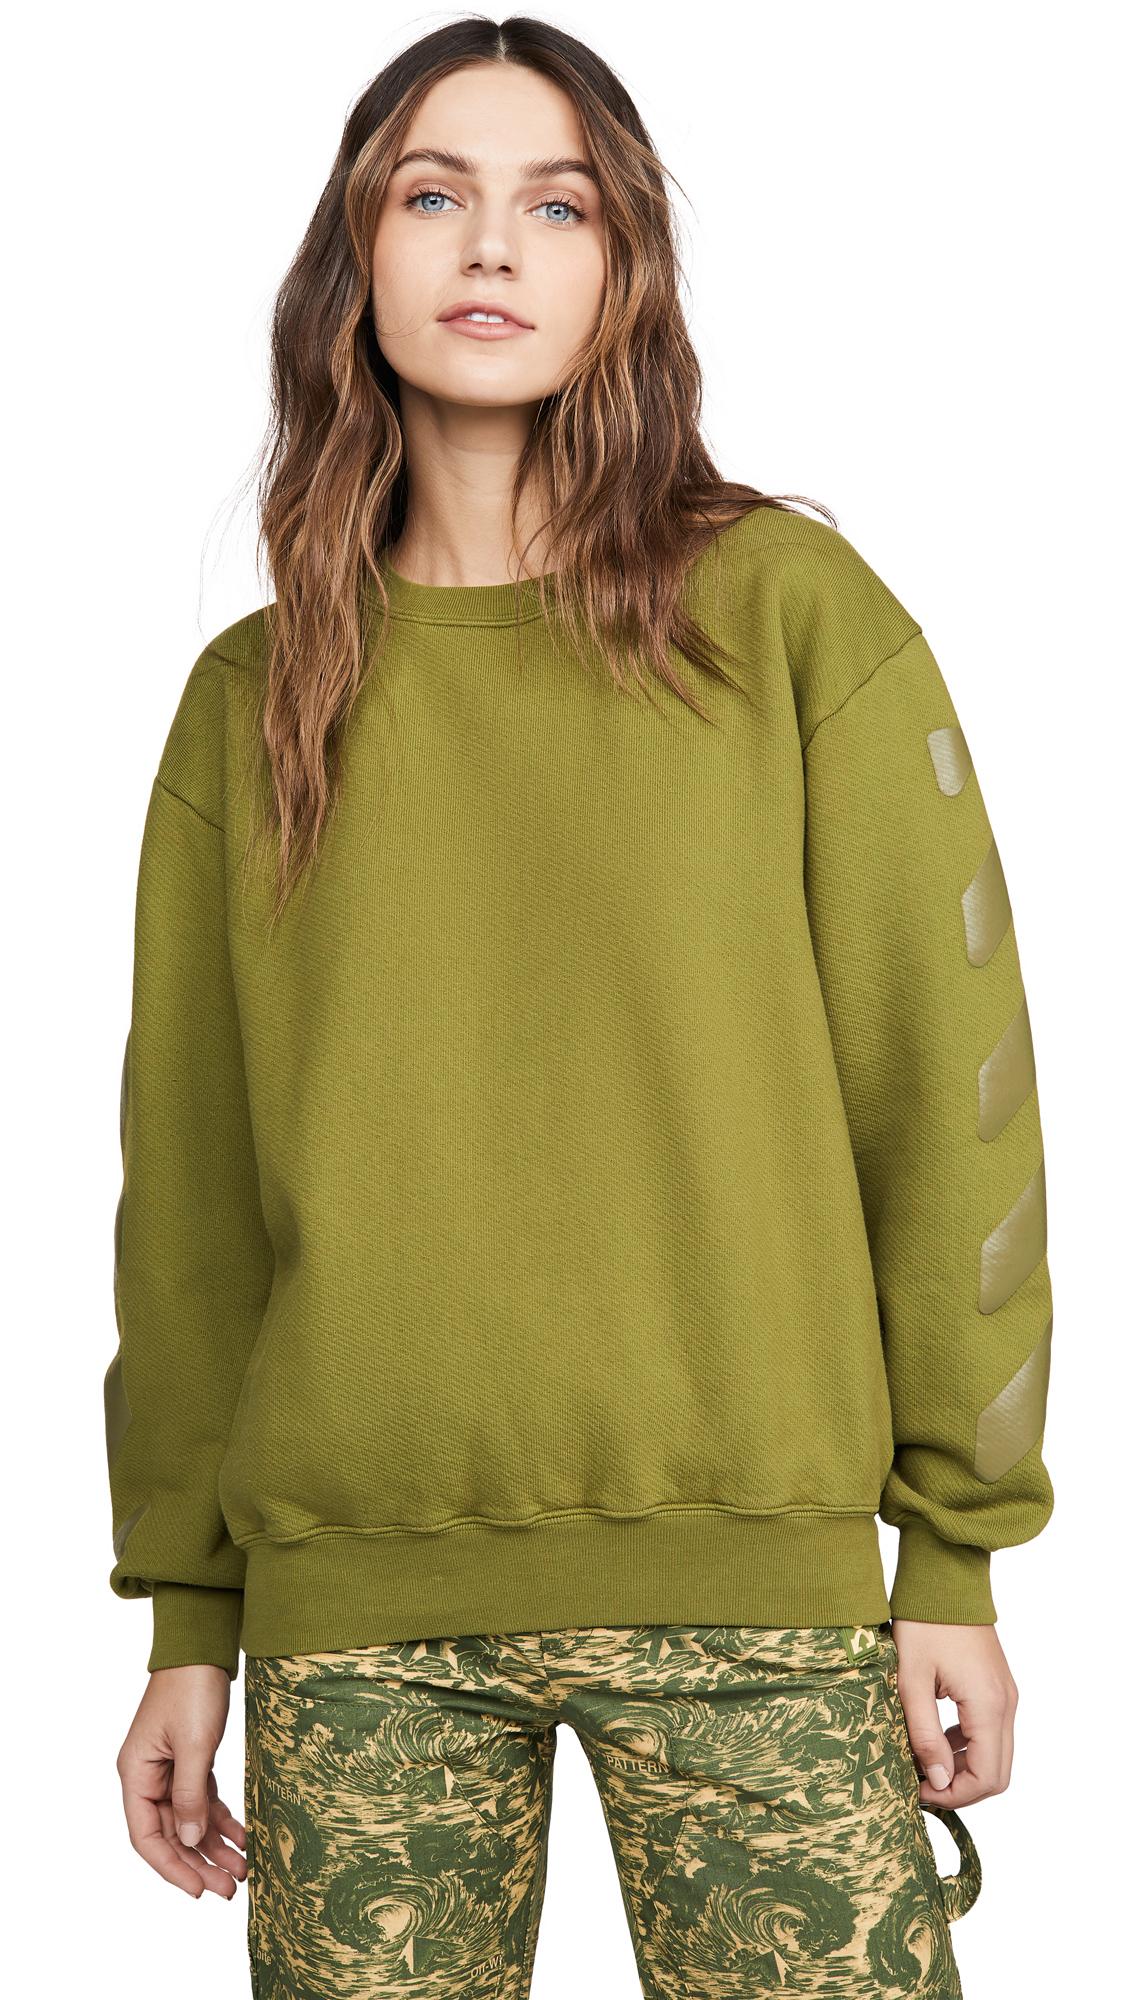 Off-White Diagonal Oversize Crew Neck Sweatshirt - 50% Off Sale